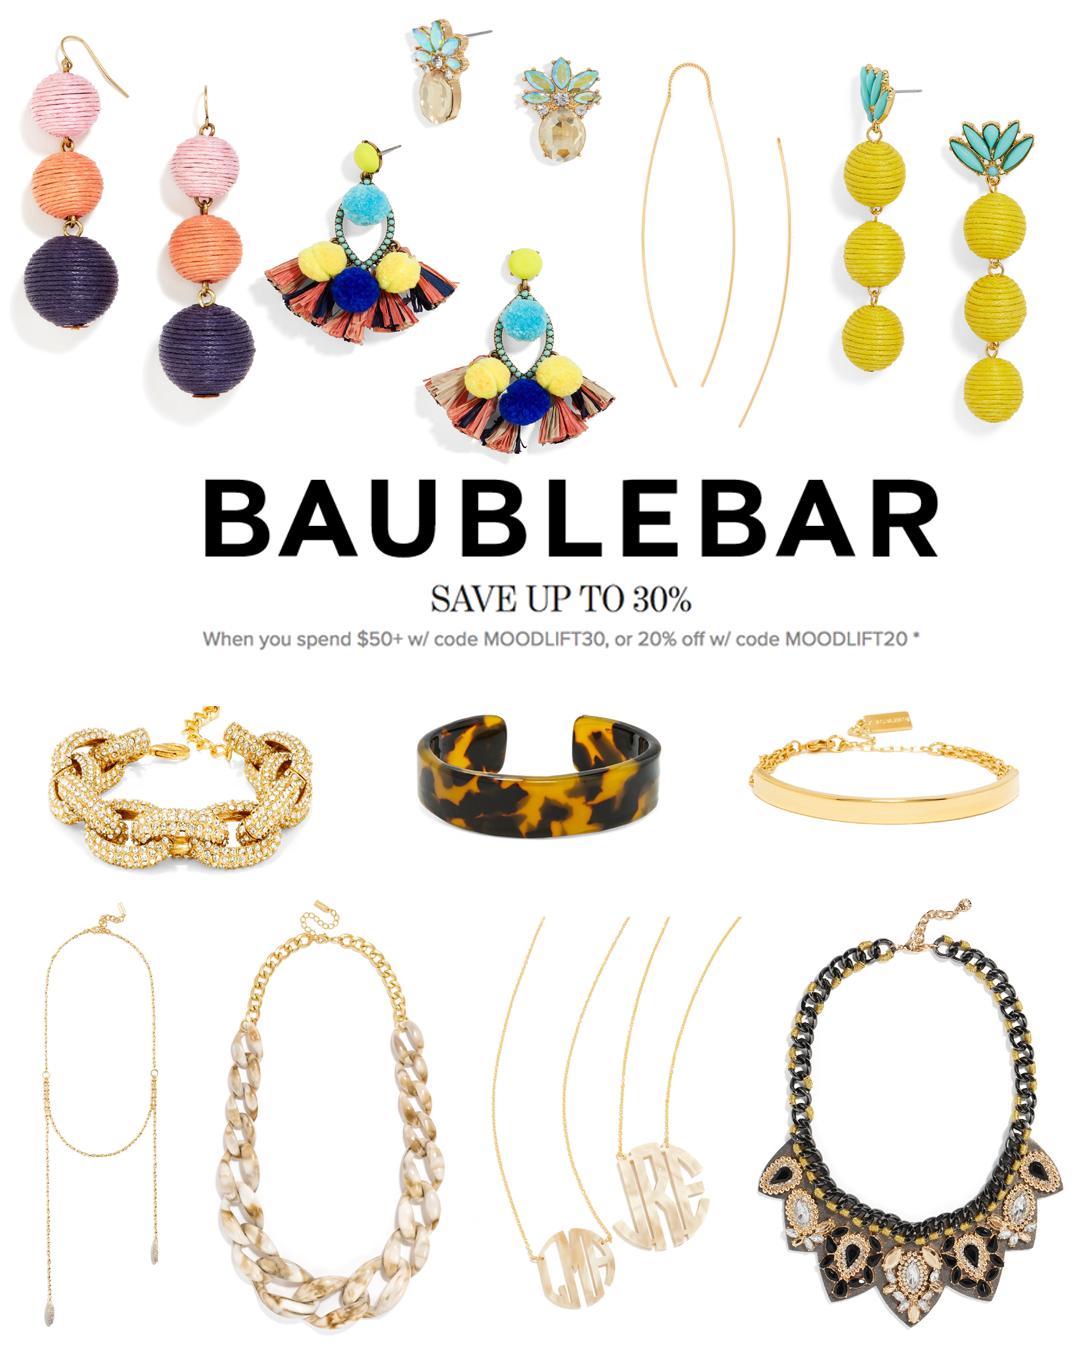 Baublebar Sale Collage Angela Lanter Hello Gorgeous